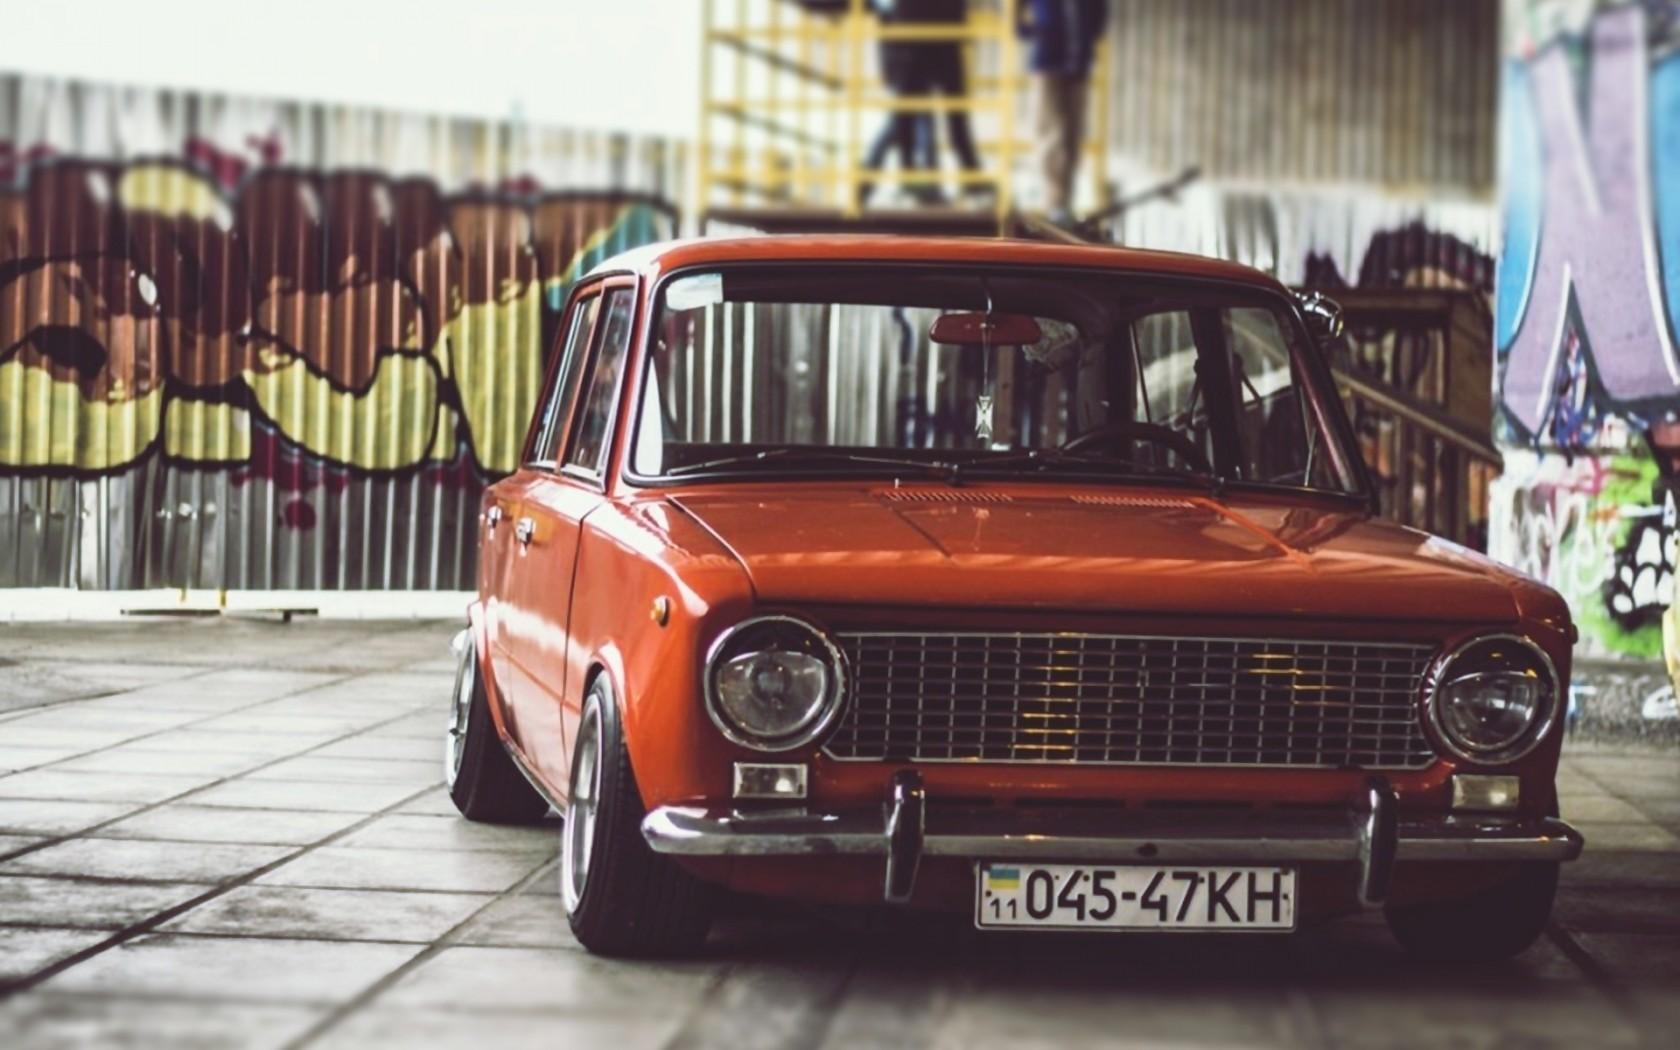 Wallpaper 1680x1050 Px Lada Lada 2101 Low Old Car